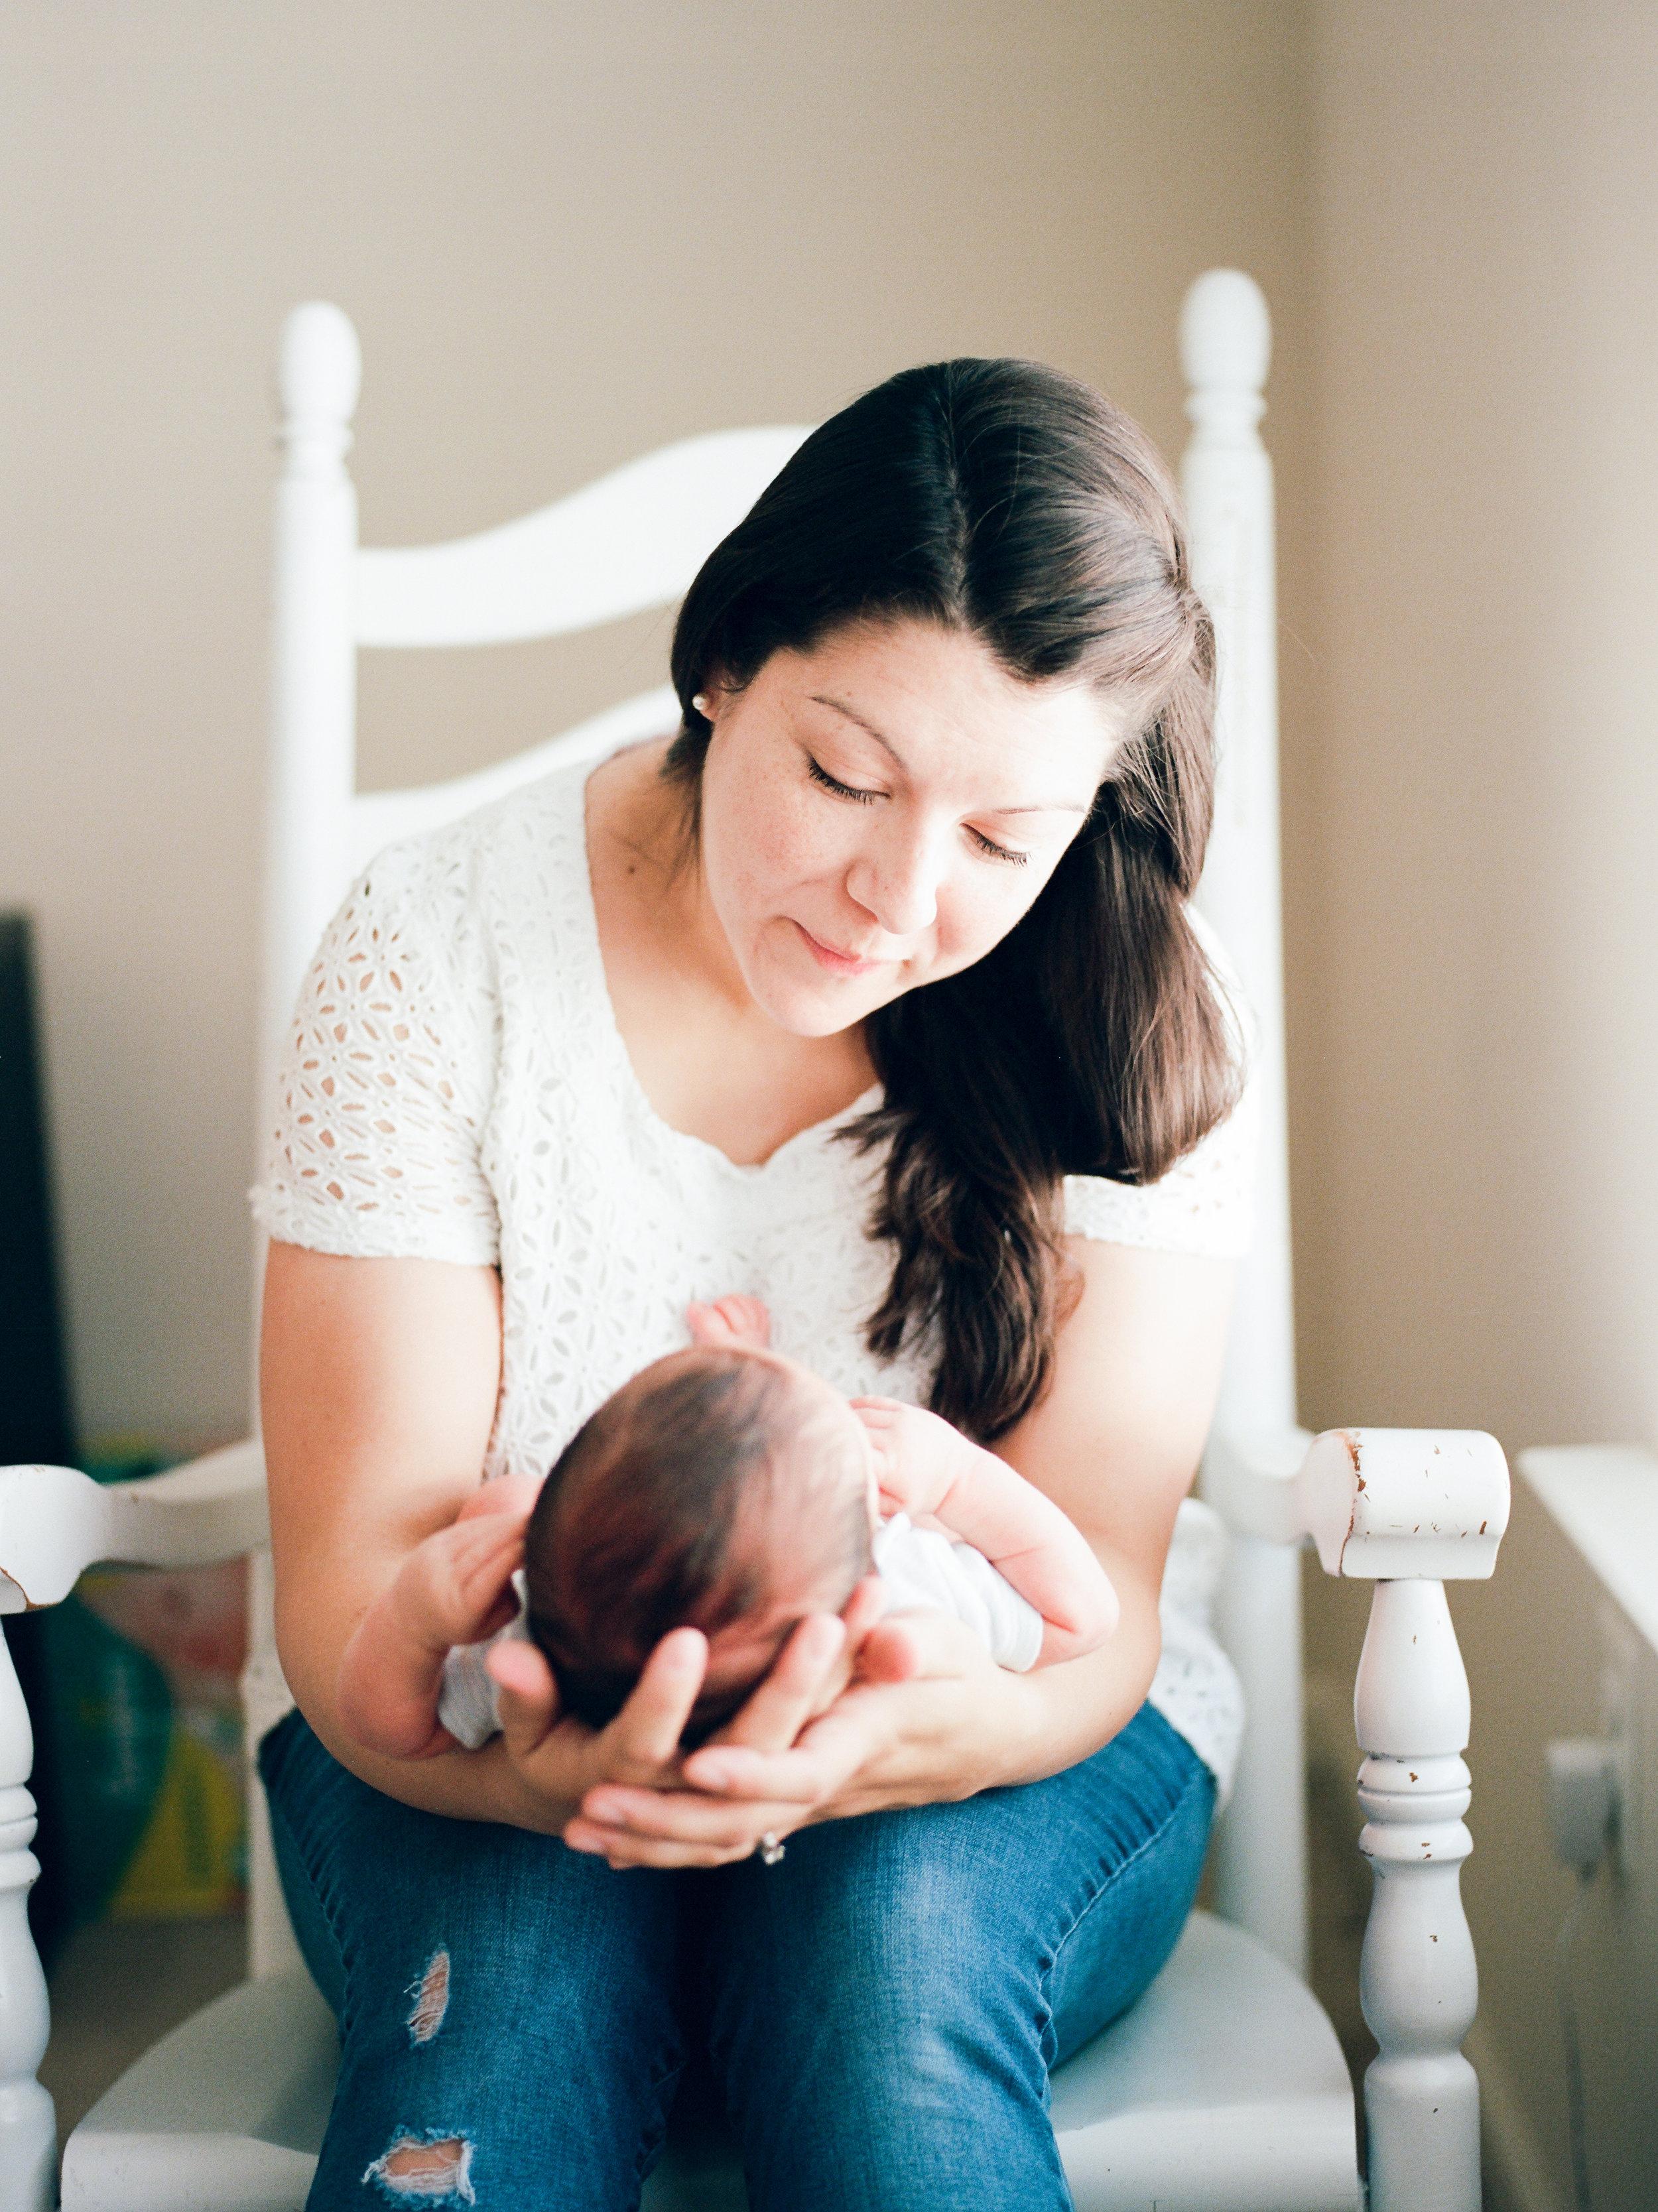 ArmatoPhotography-newborn-portrait-clarksburg-Maryland